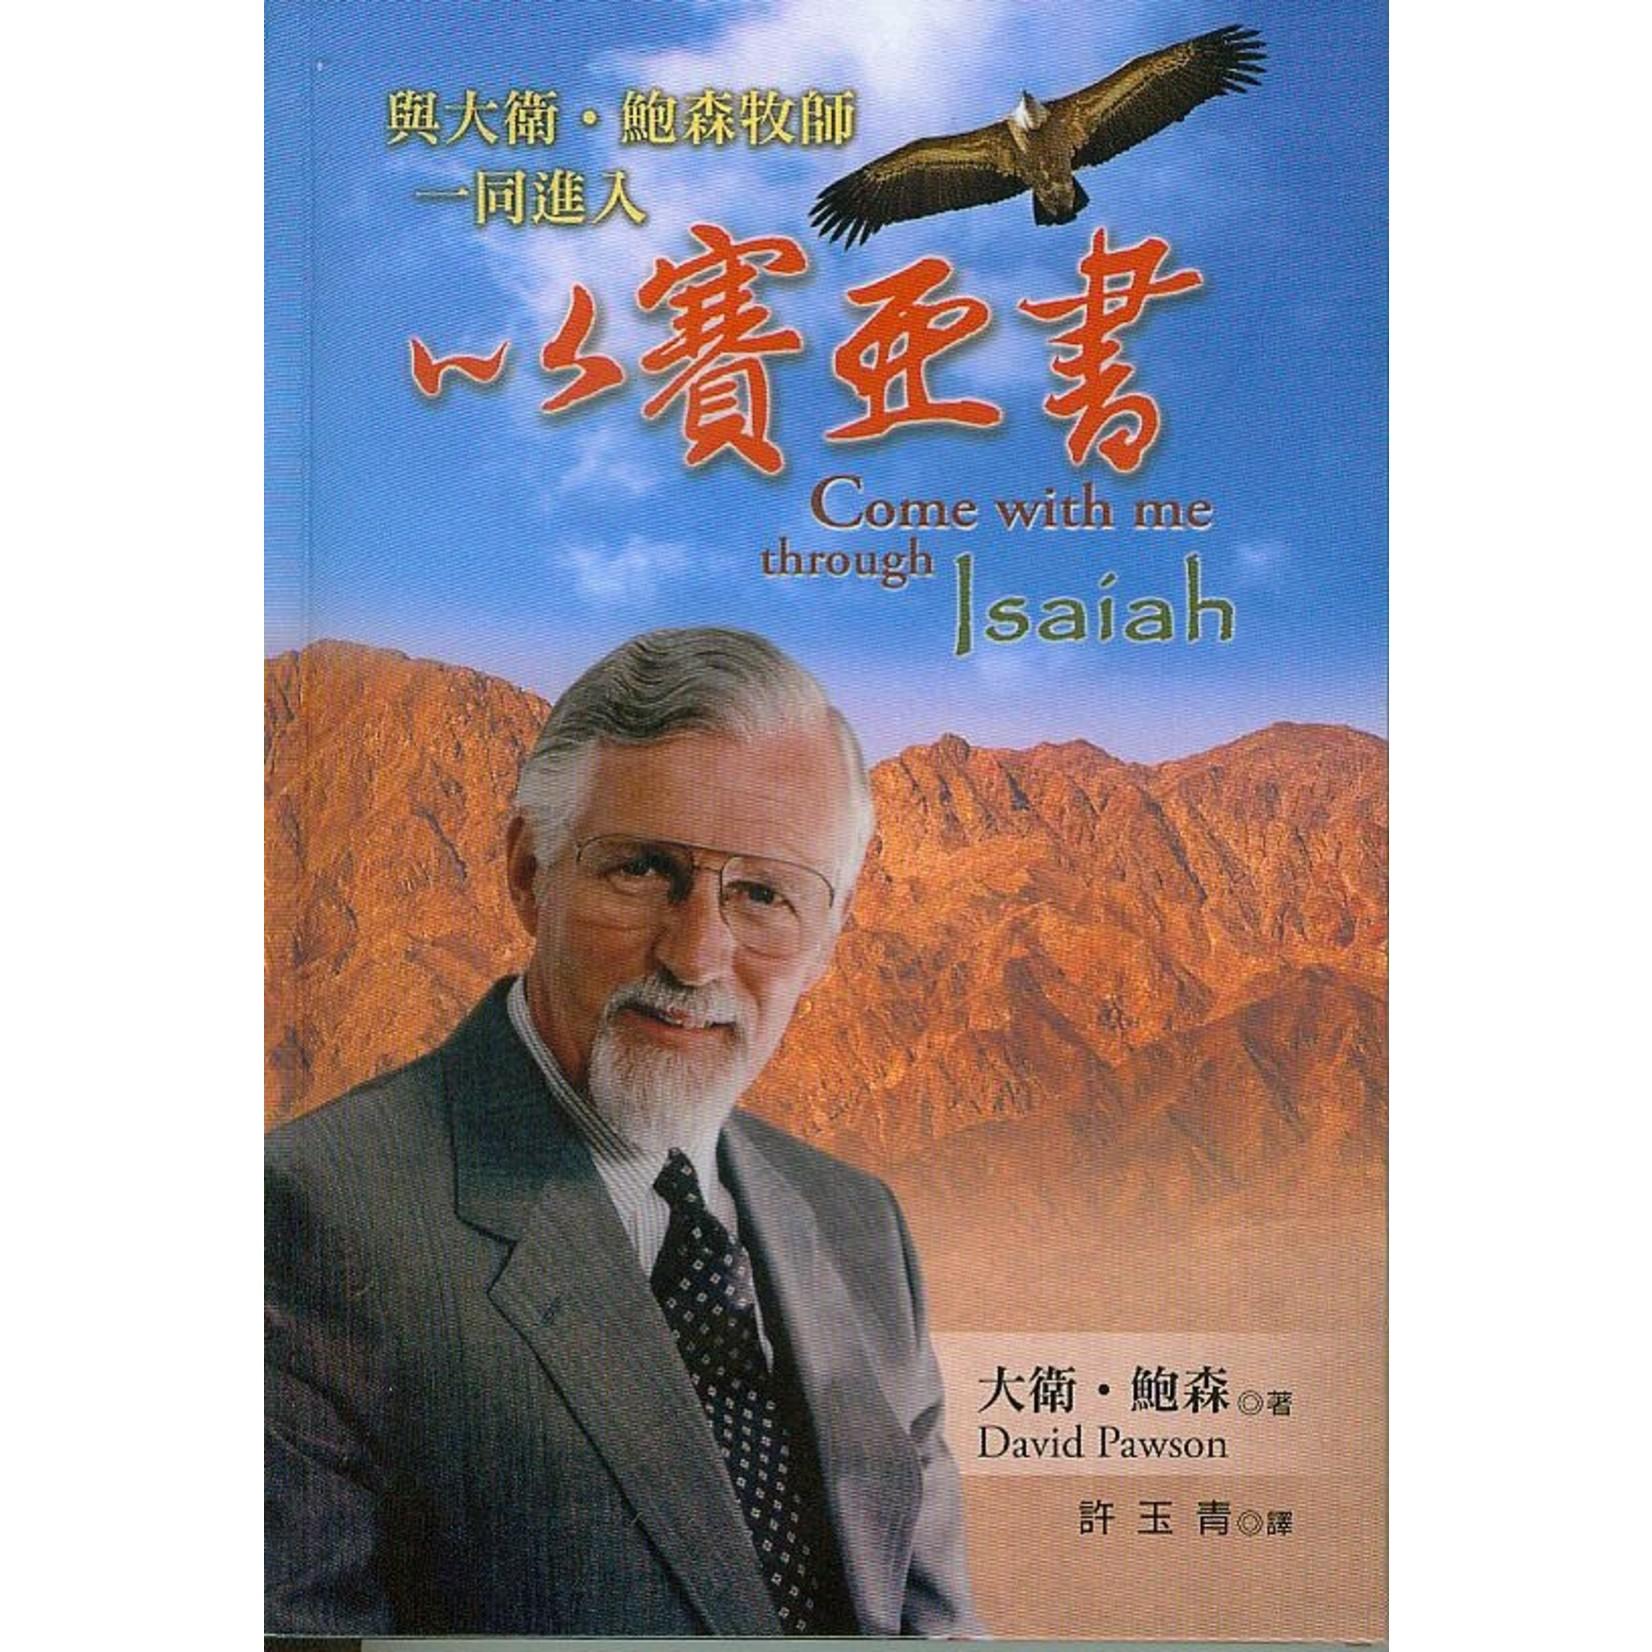 台北靈糧堂 Bread of Life Christian Church in Taipei 與大衛鮑森牧師一同進入以賽亞書 Come with me through Isaiah